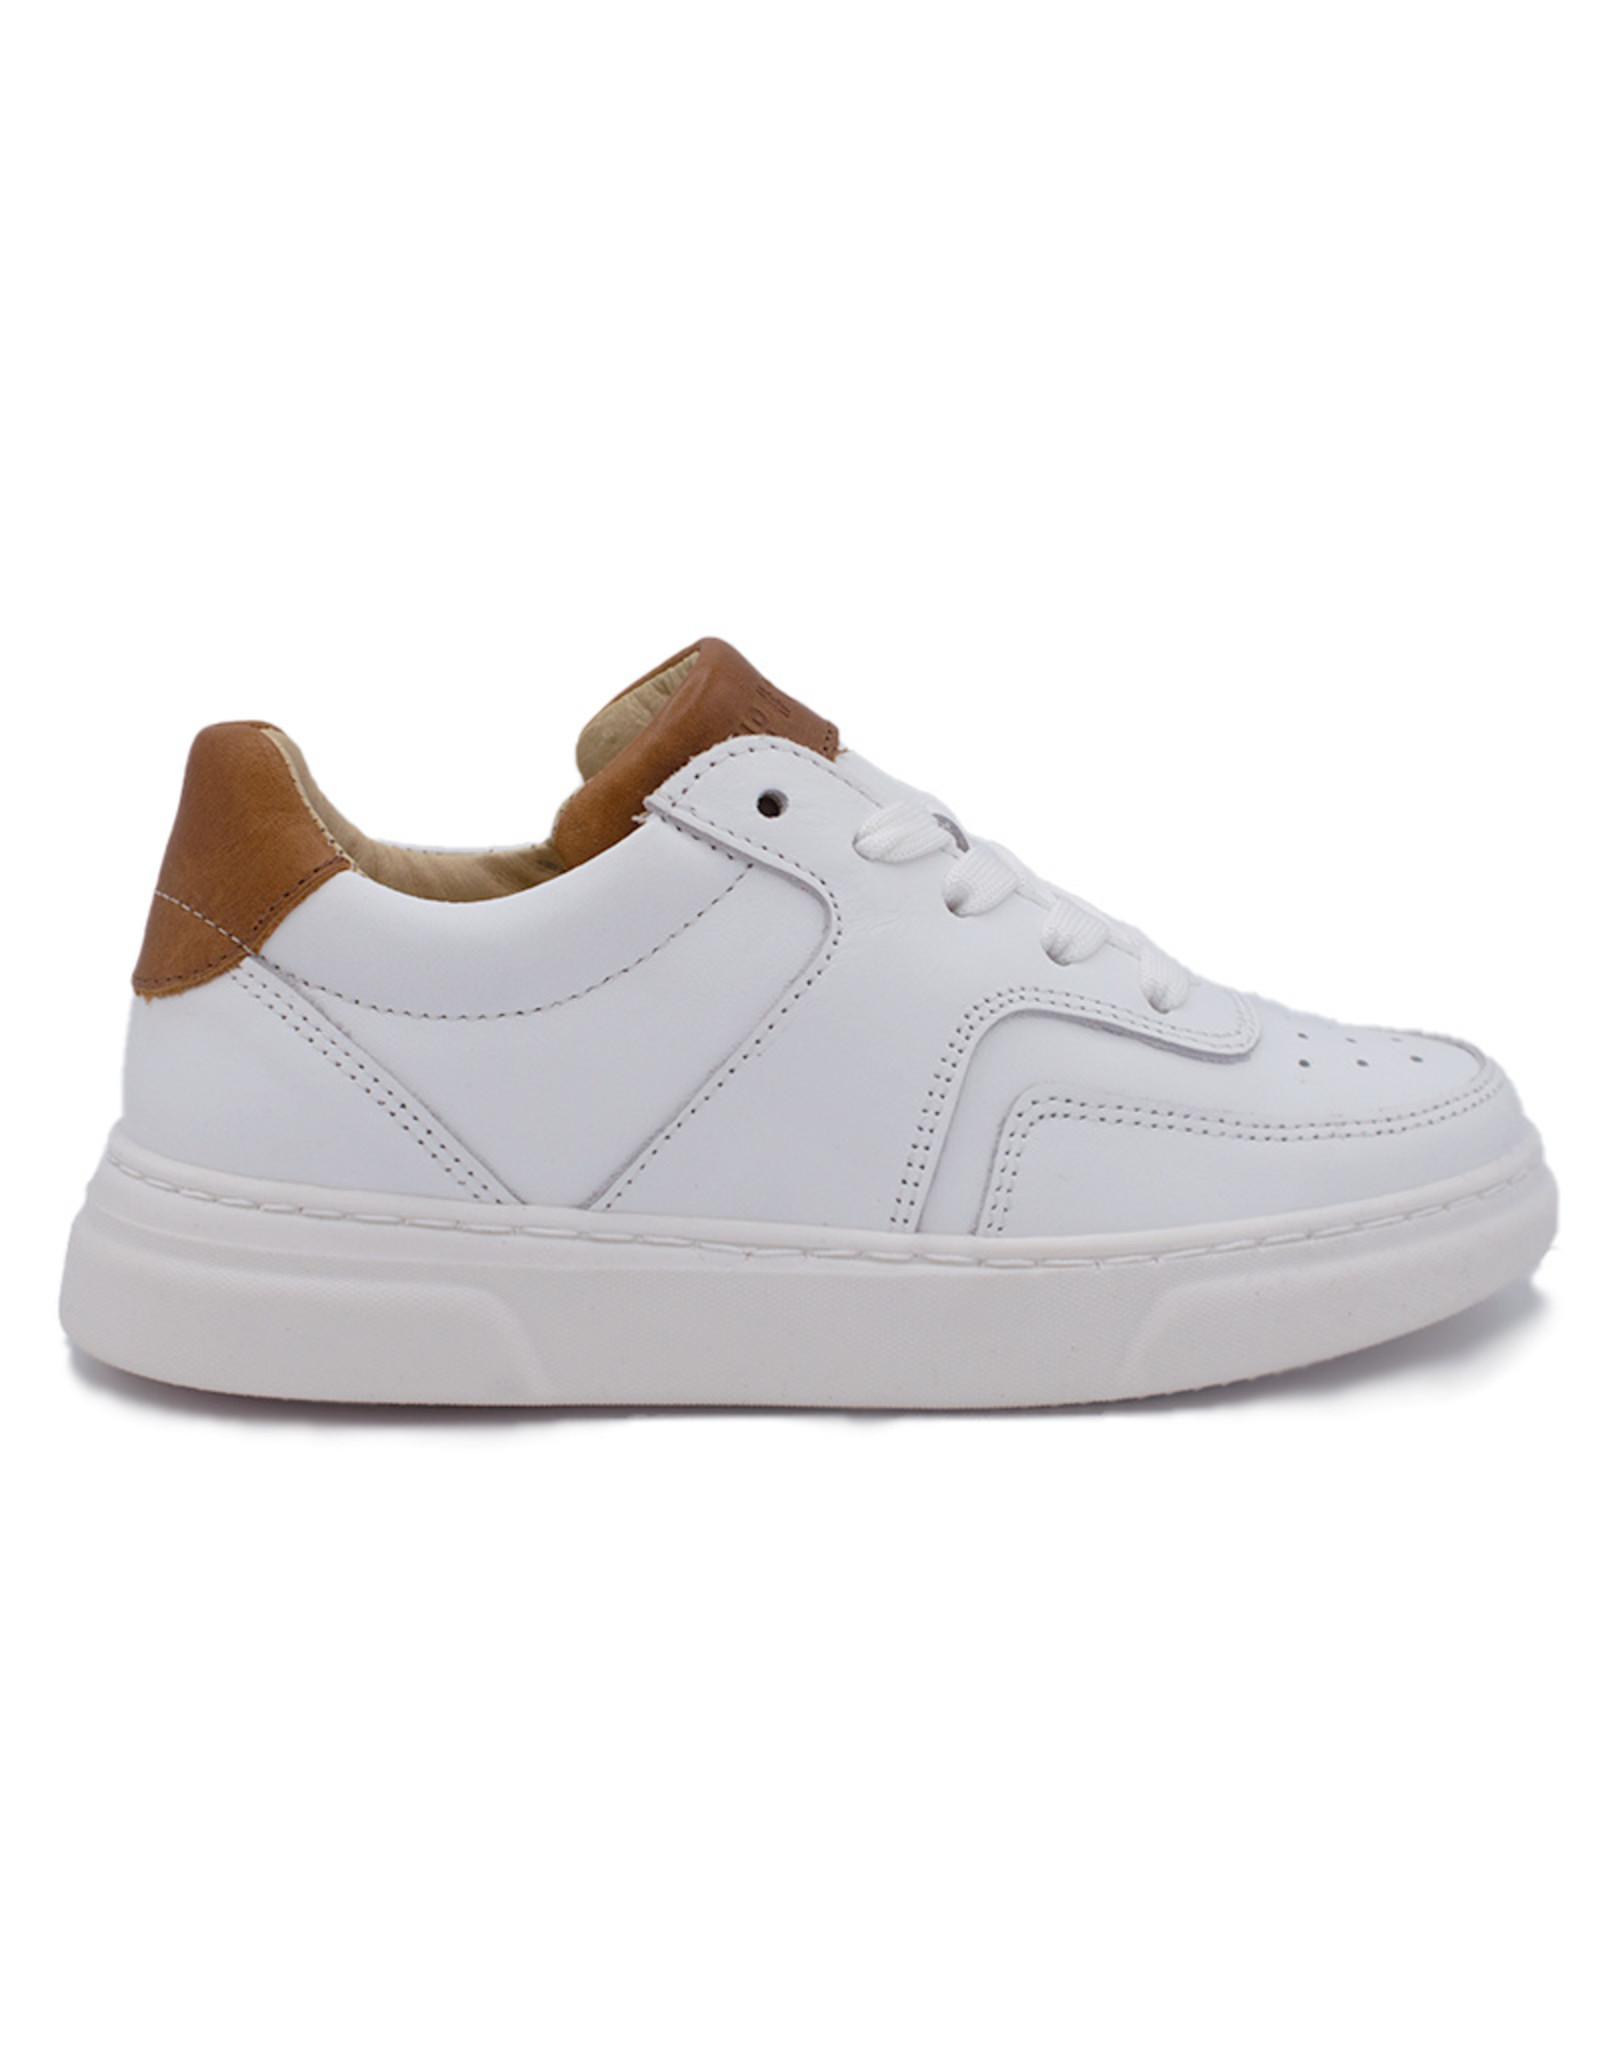 HIP HIP sneaker wit perforato